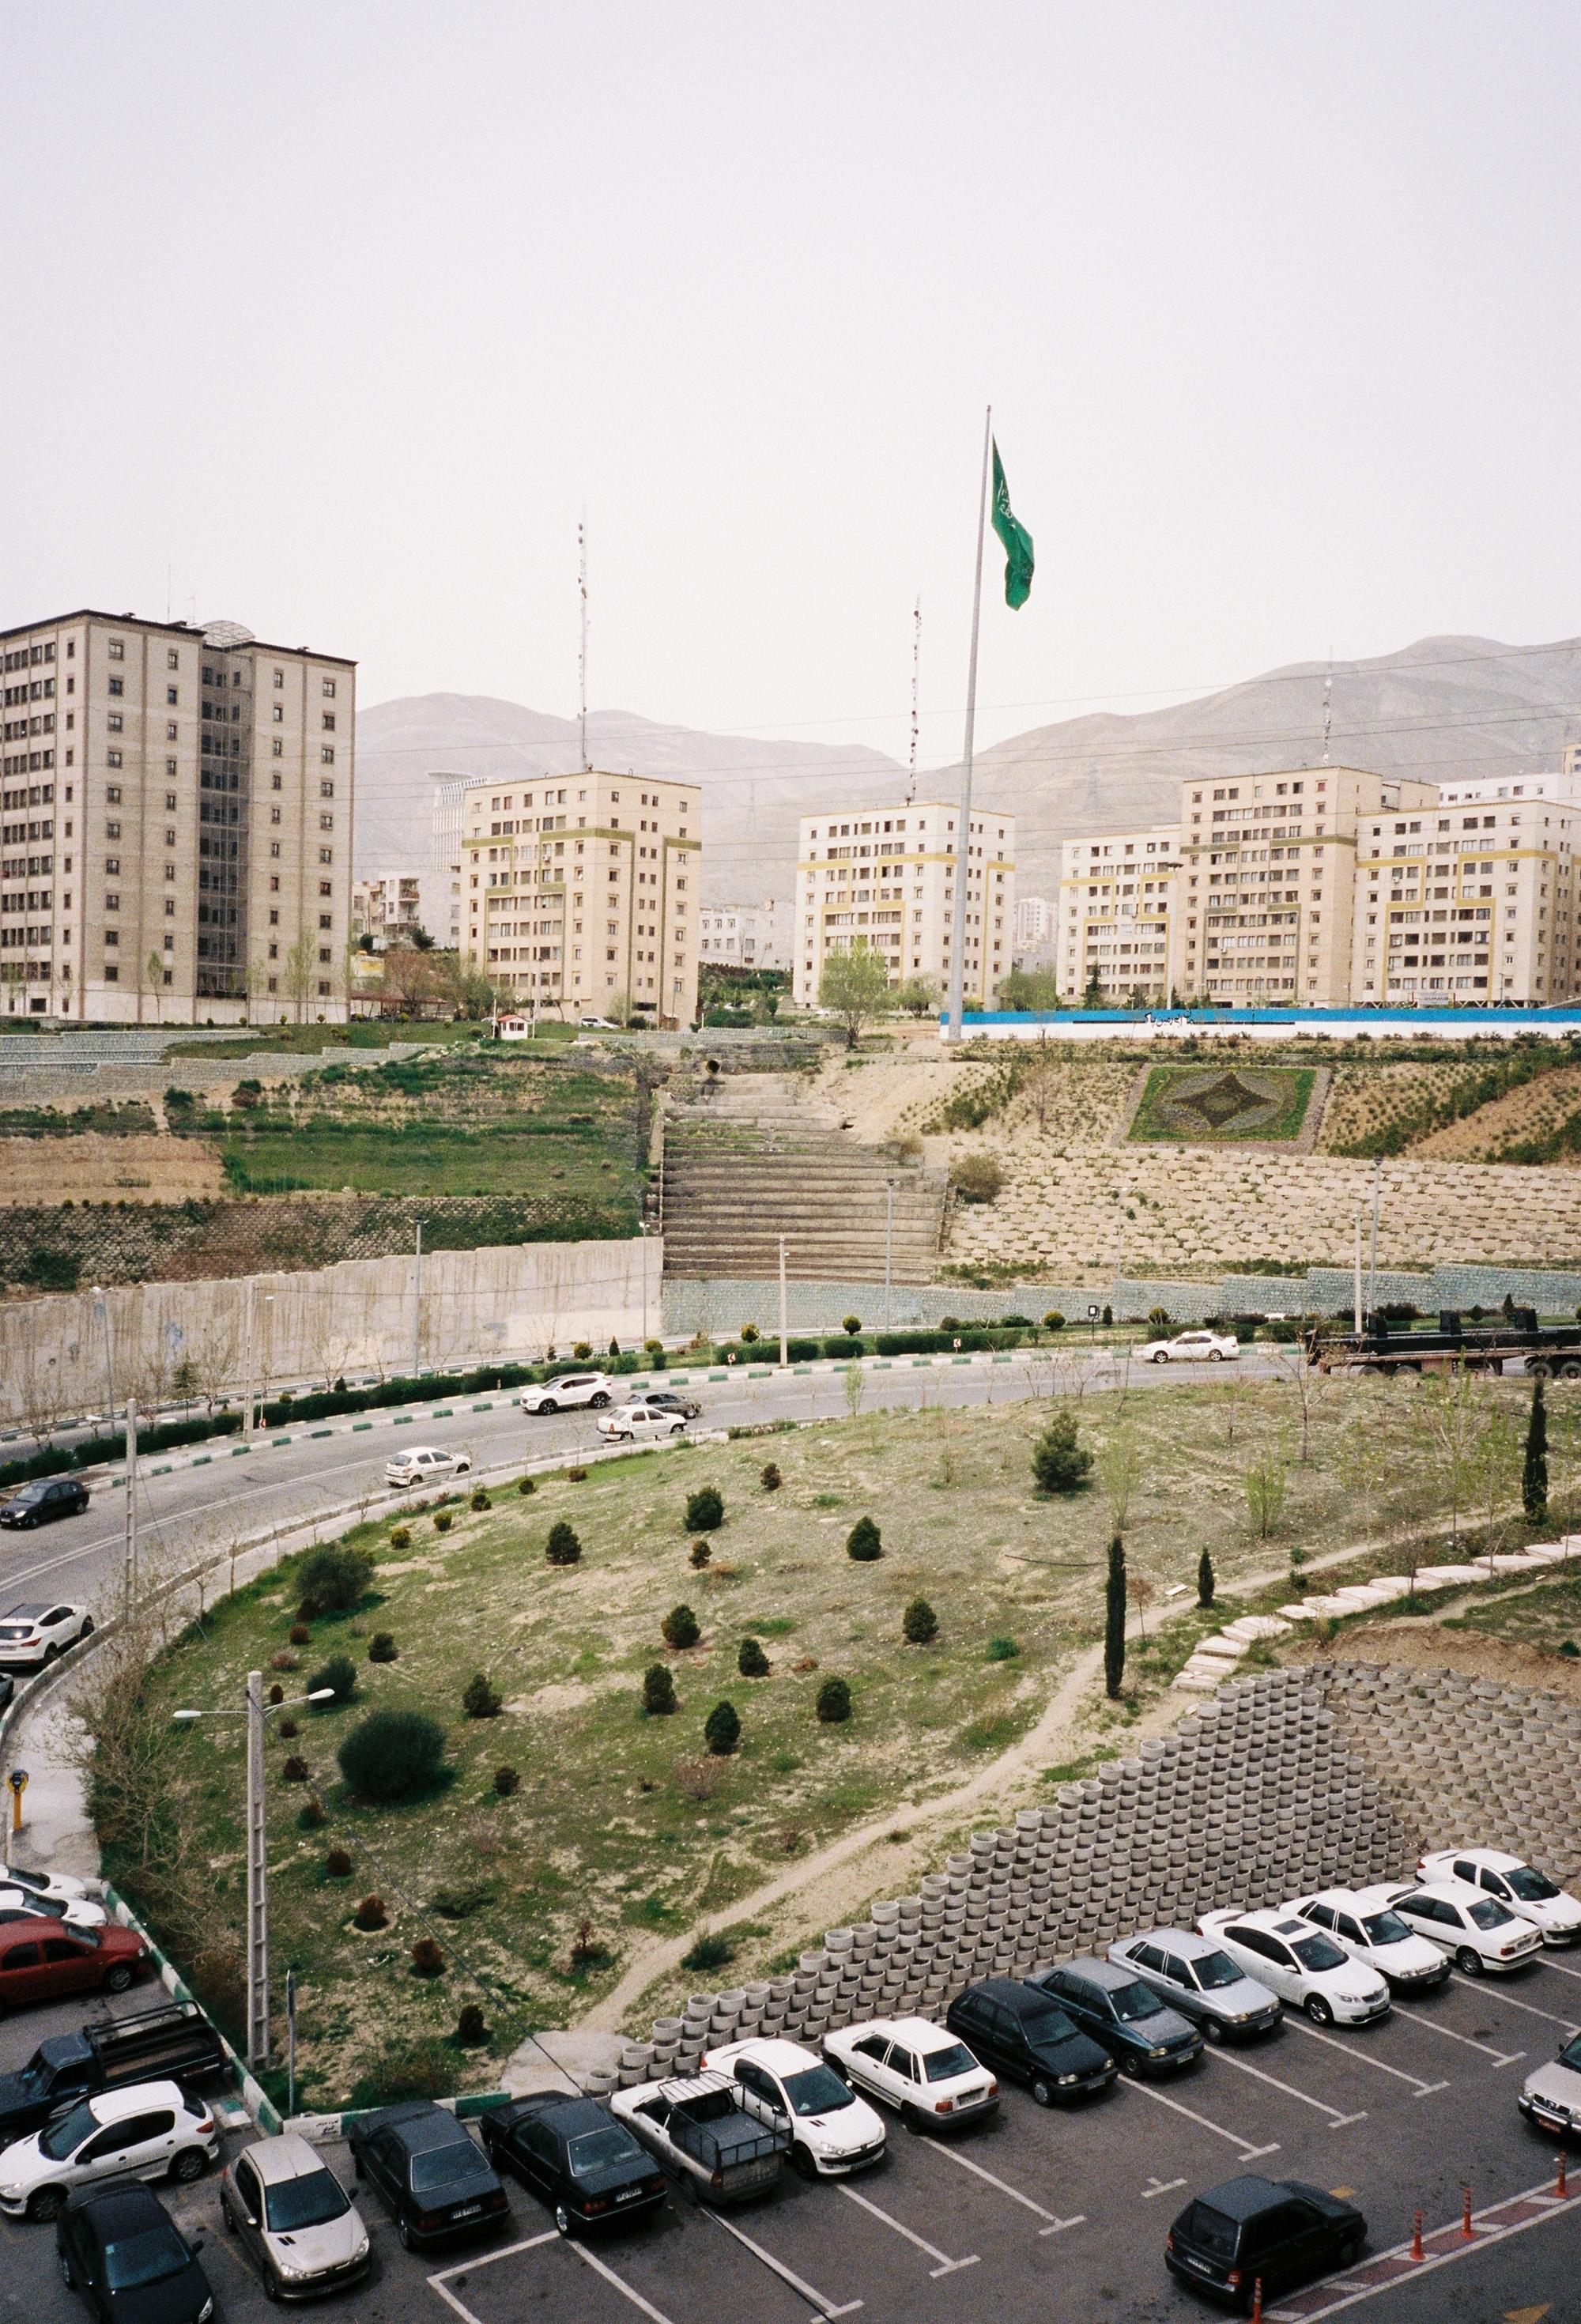 District of Sa'adat Abad, north Tehran, 2017. © Laure d'Utruy